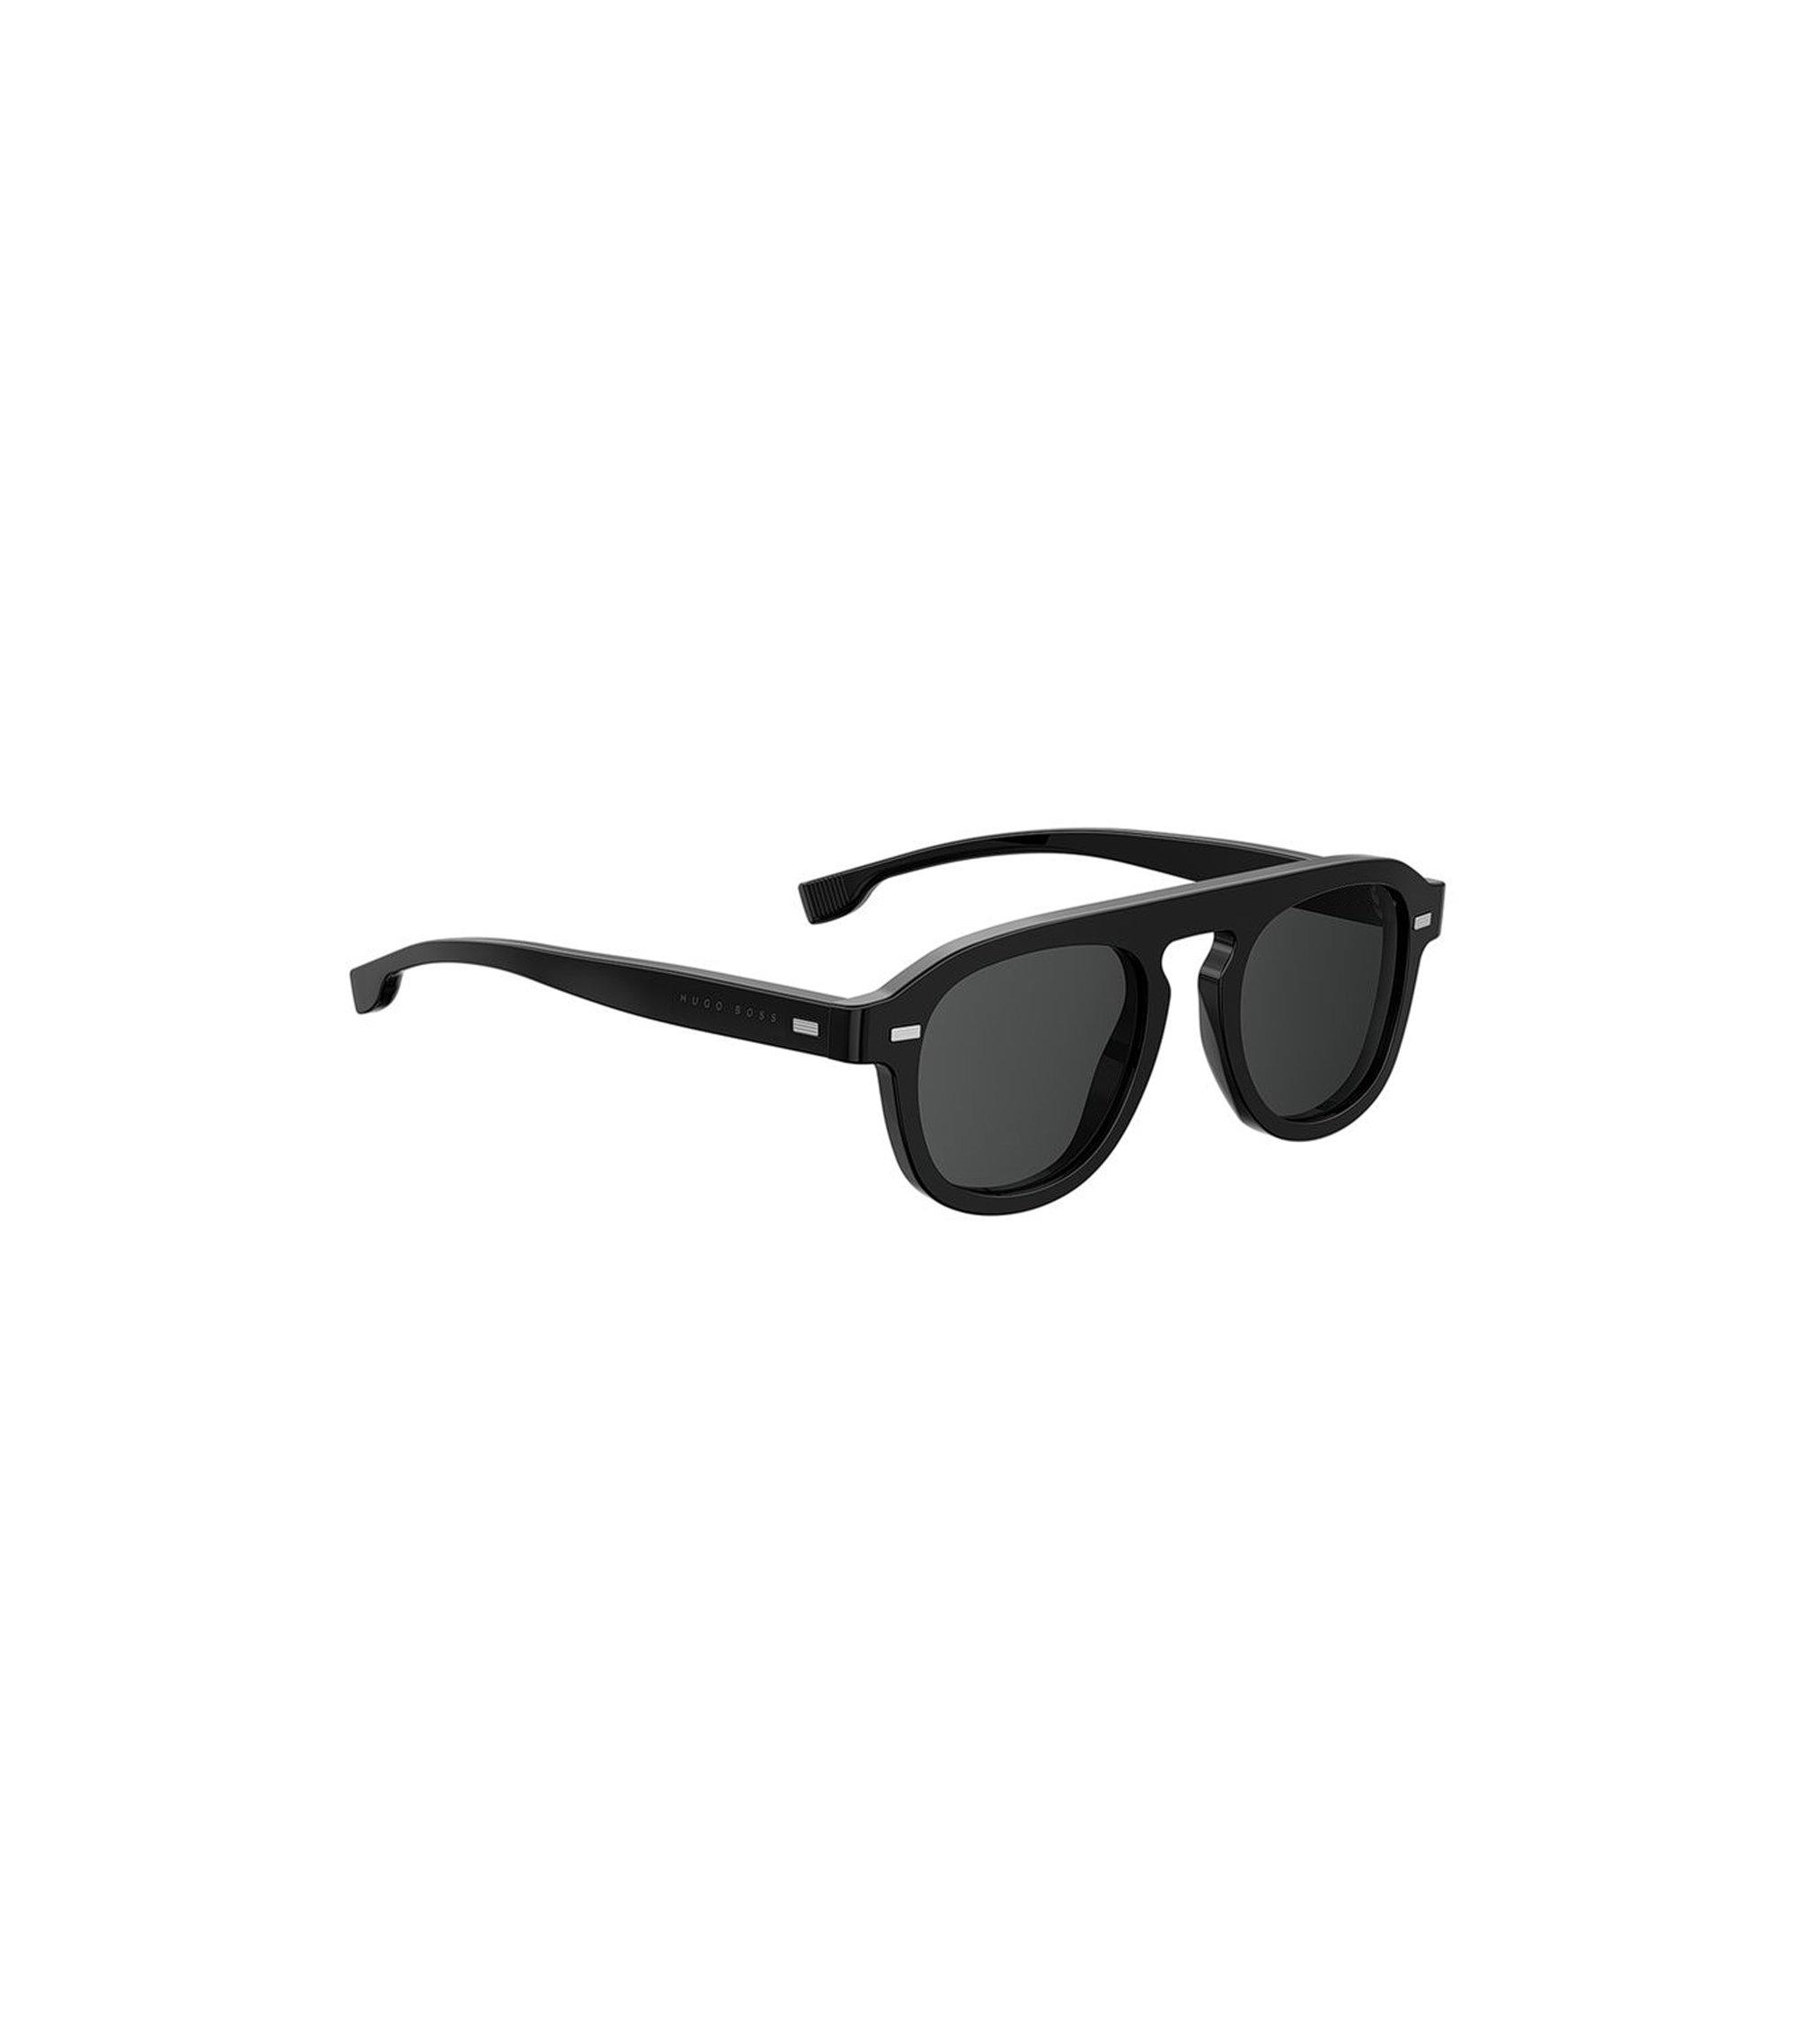 Vintage-inspired sunglasses with black acetate frames, Black